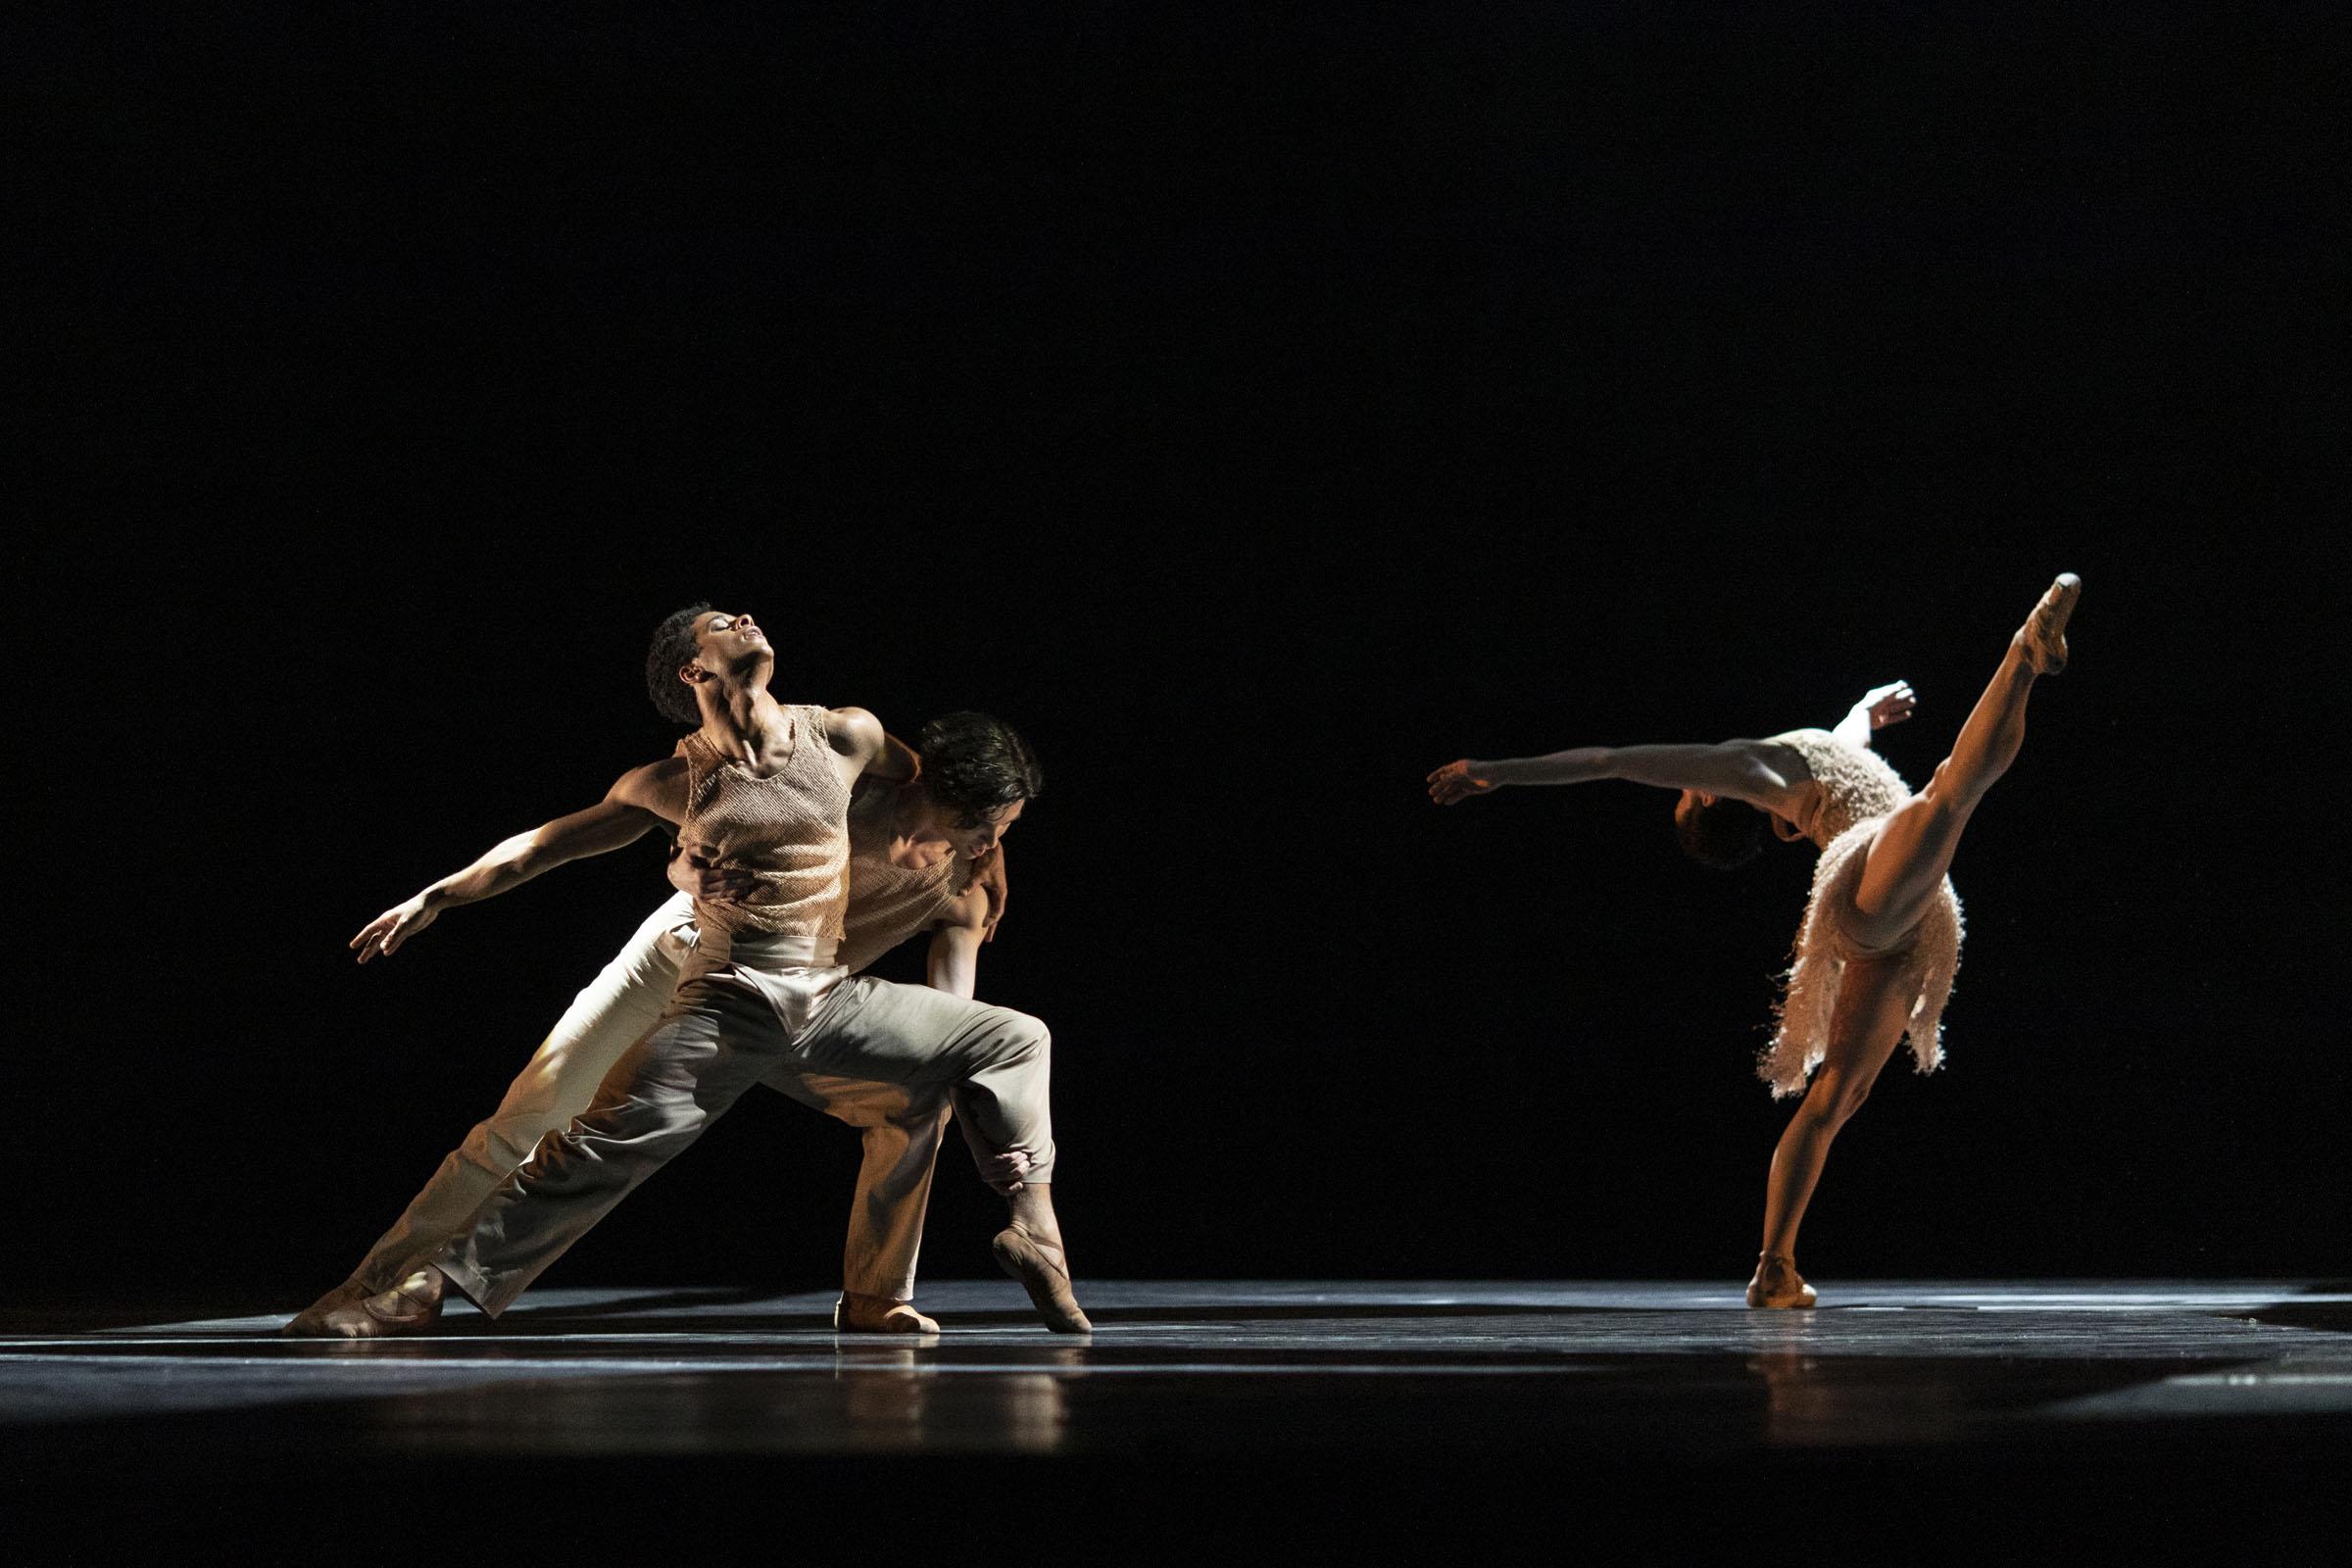 Marcelino Sambé, Stanisław Węgrzyn and Natalia Osipova in 21st 'Century Choreographers - Optional Family: a divertissement'